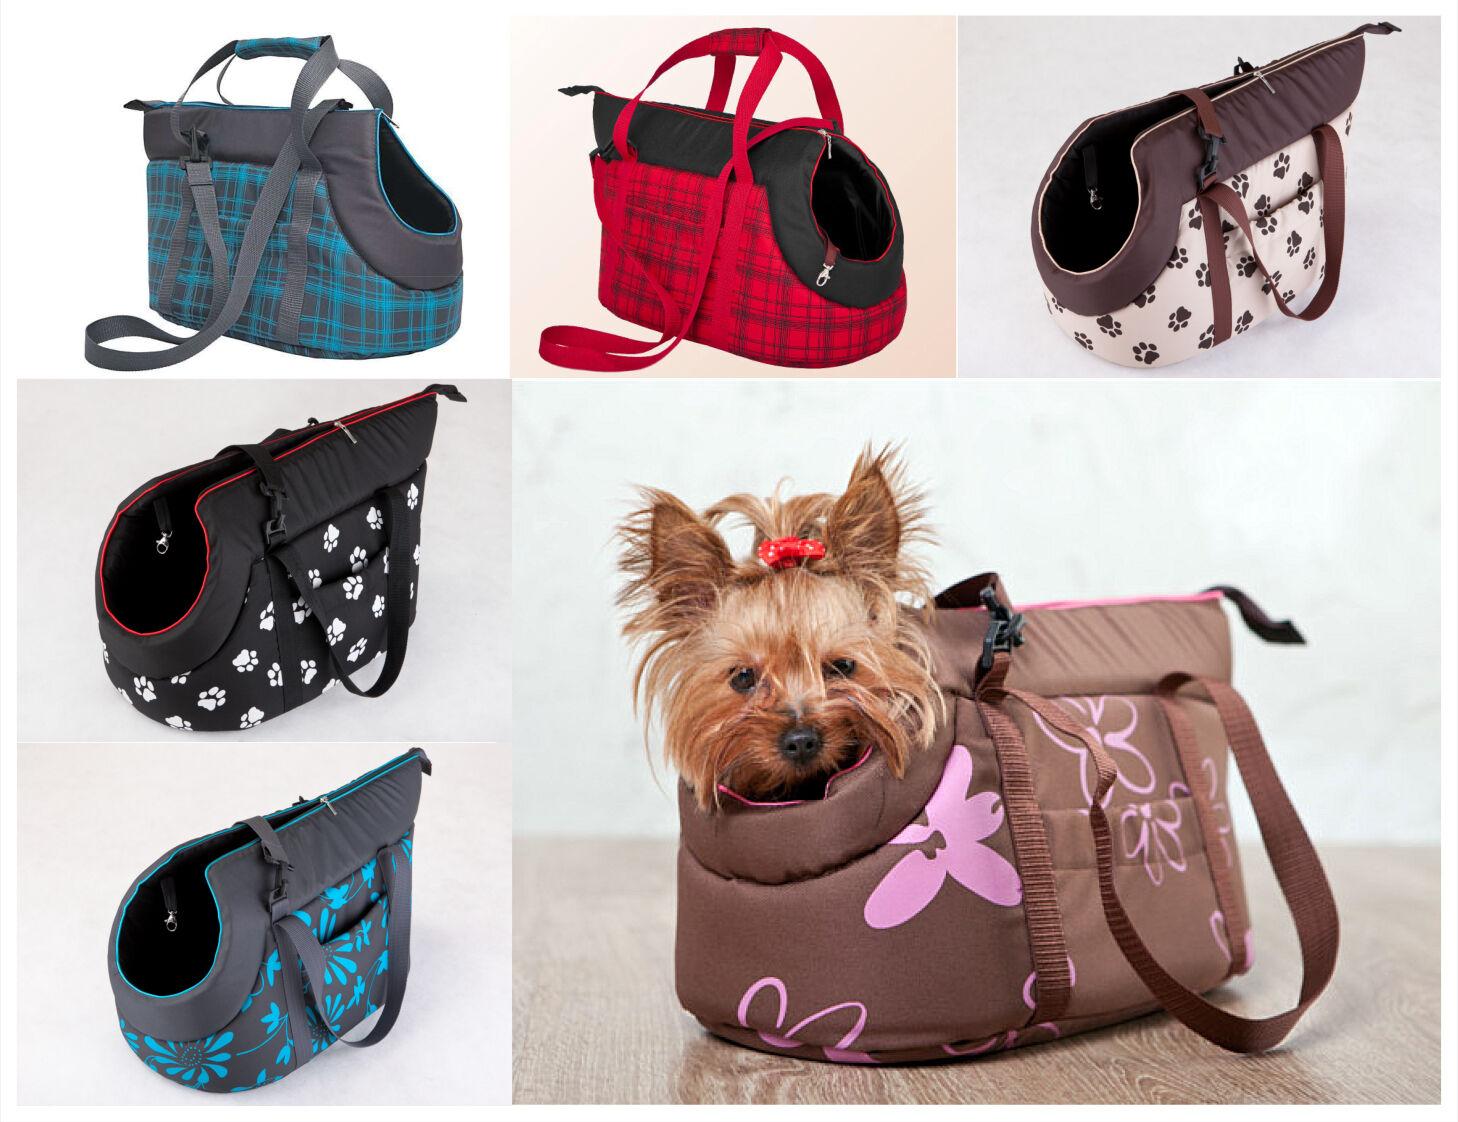 376a8058c6 Dog Travel Carrier Bag Small Pet Cat Cat Cat Puppy Portable Transporter  261b07